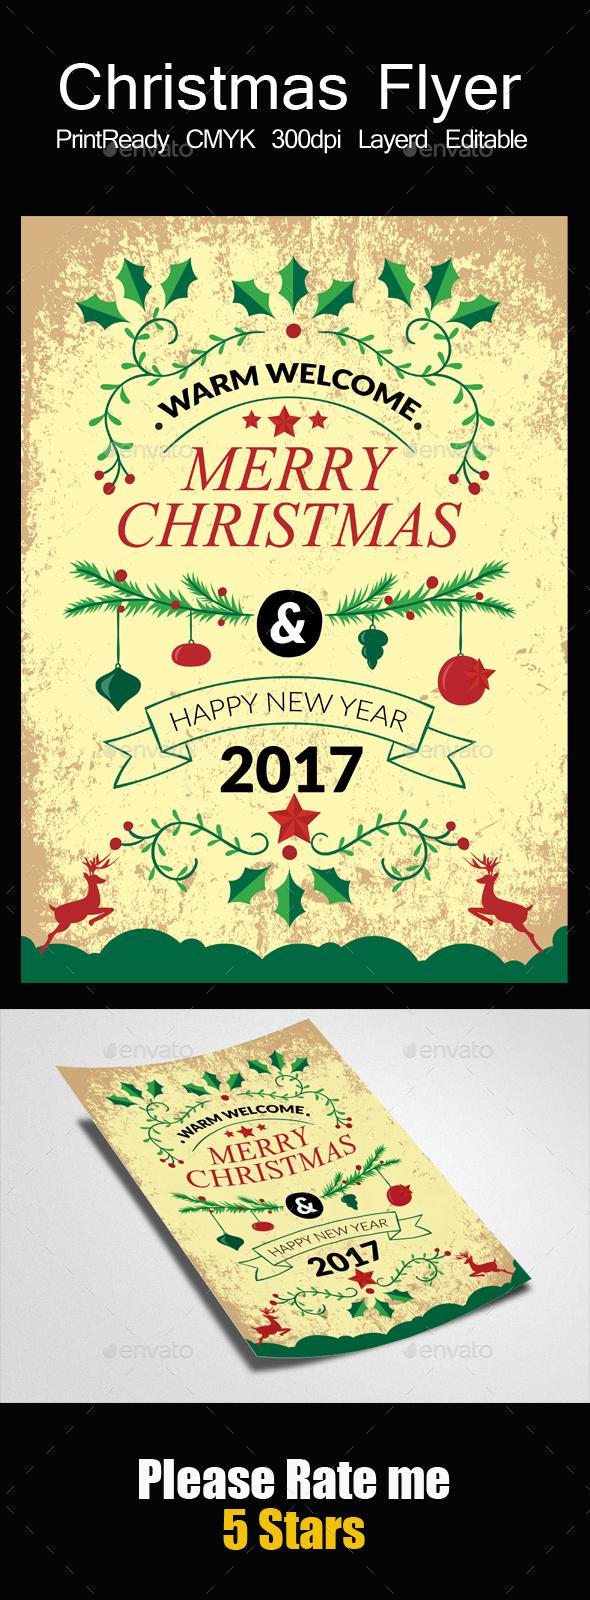 Christmas Festival Flyer Psd - Events Flyers